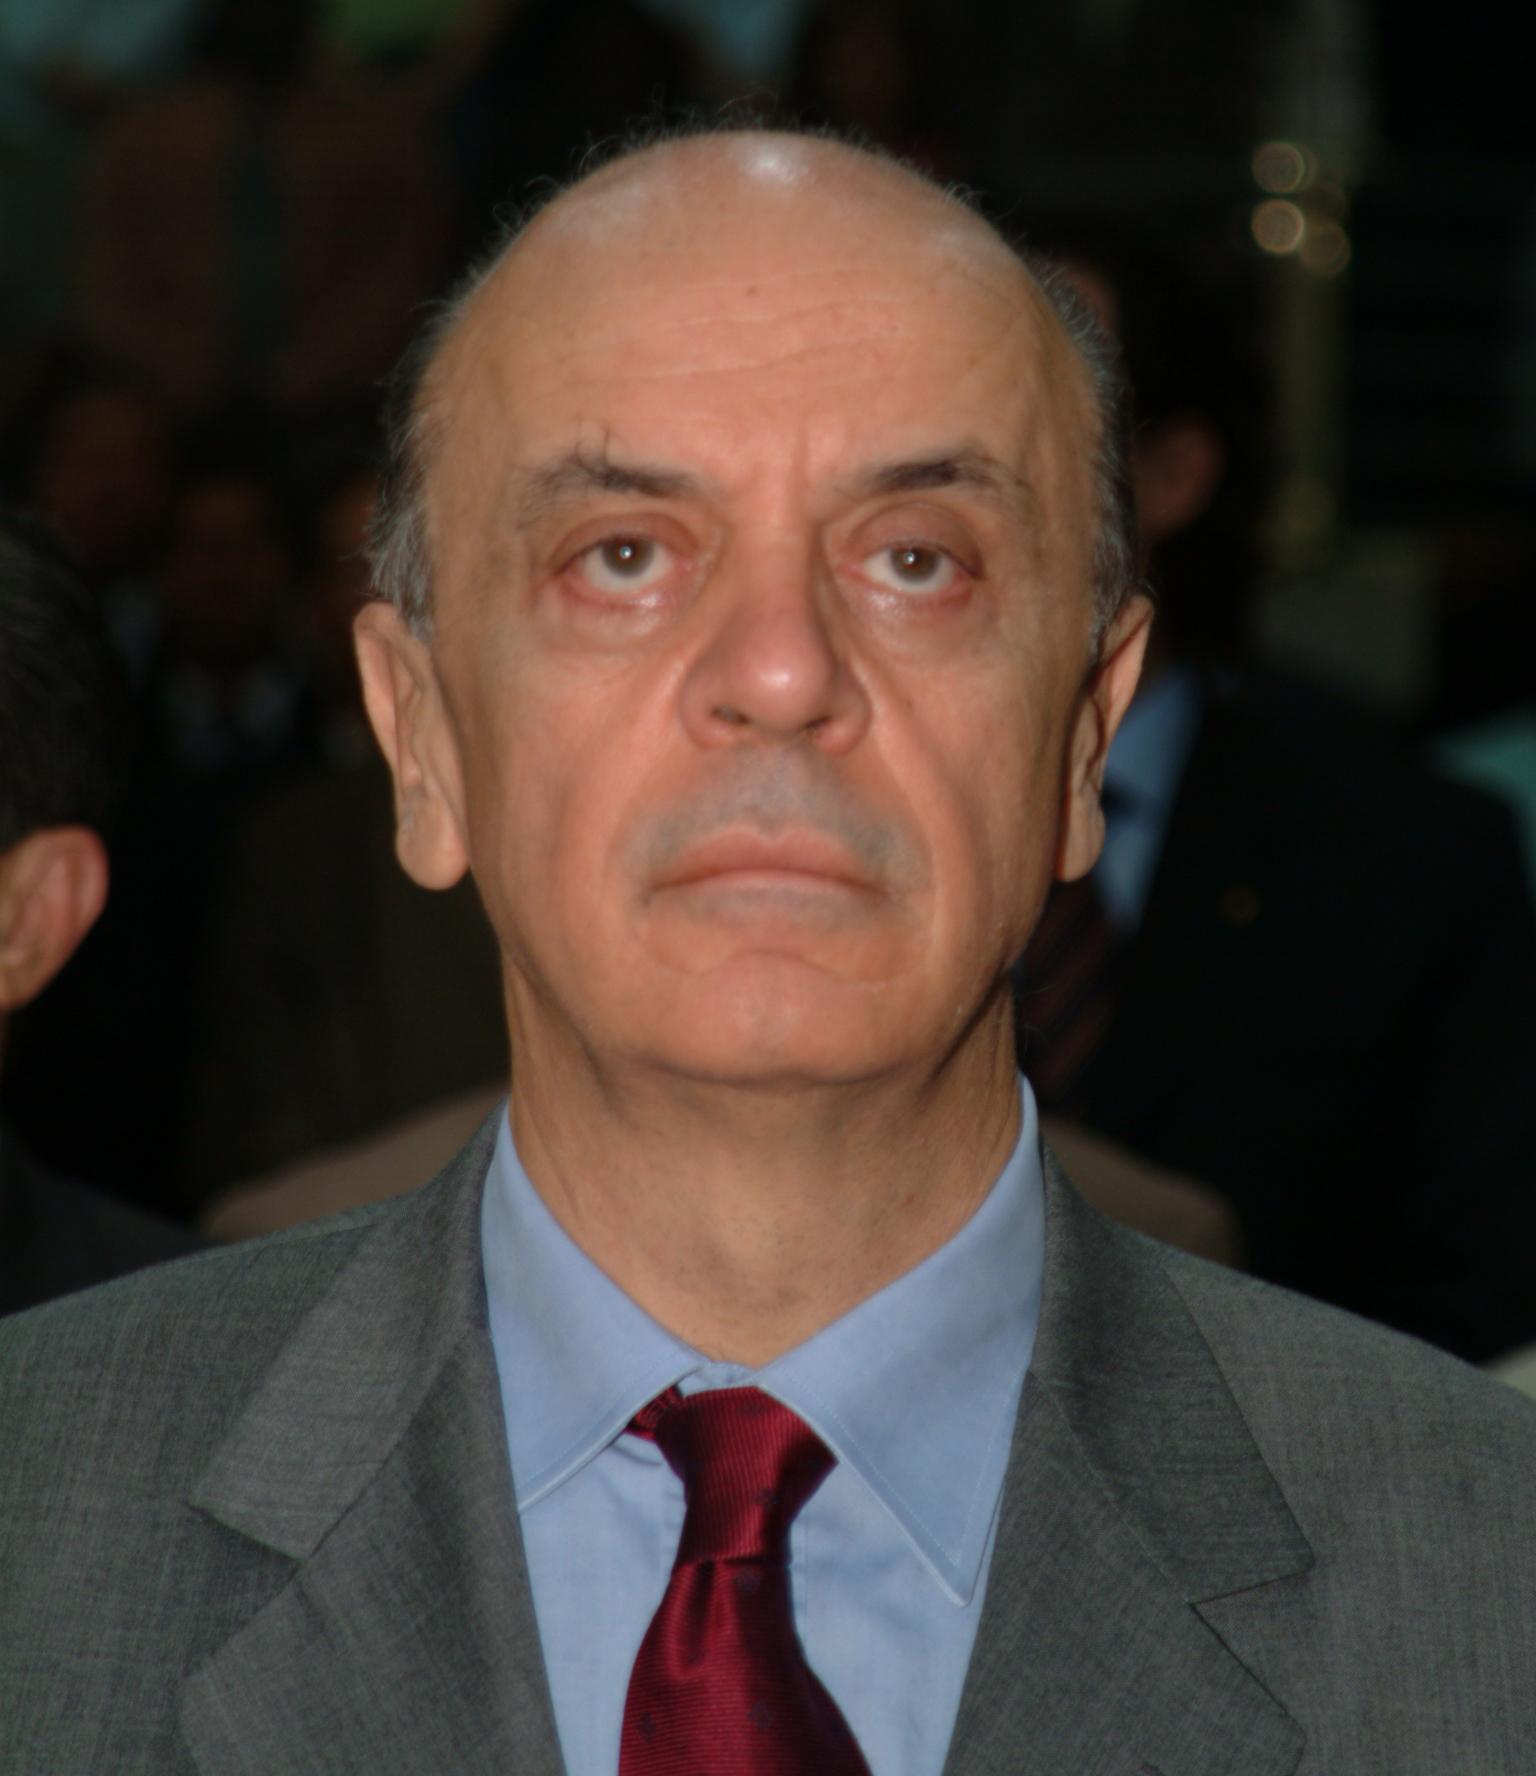 Prefeito José Serra<a style='float:right' href='https://www3.al.sp.gov.br/repositorio/noticia/hist/Serra2.jpg' target=_blank><img src='/_img/material-file-download-white.png' width='14px' alt='Clique para baixar a imagem'></a>